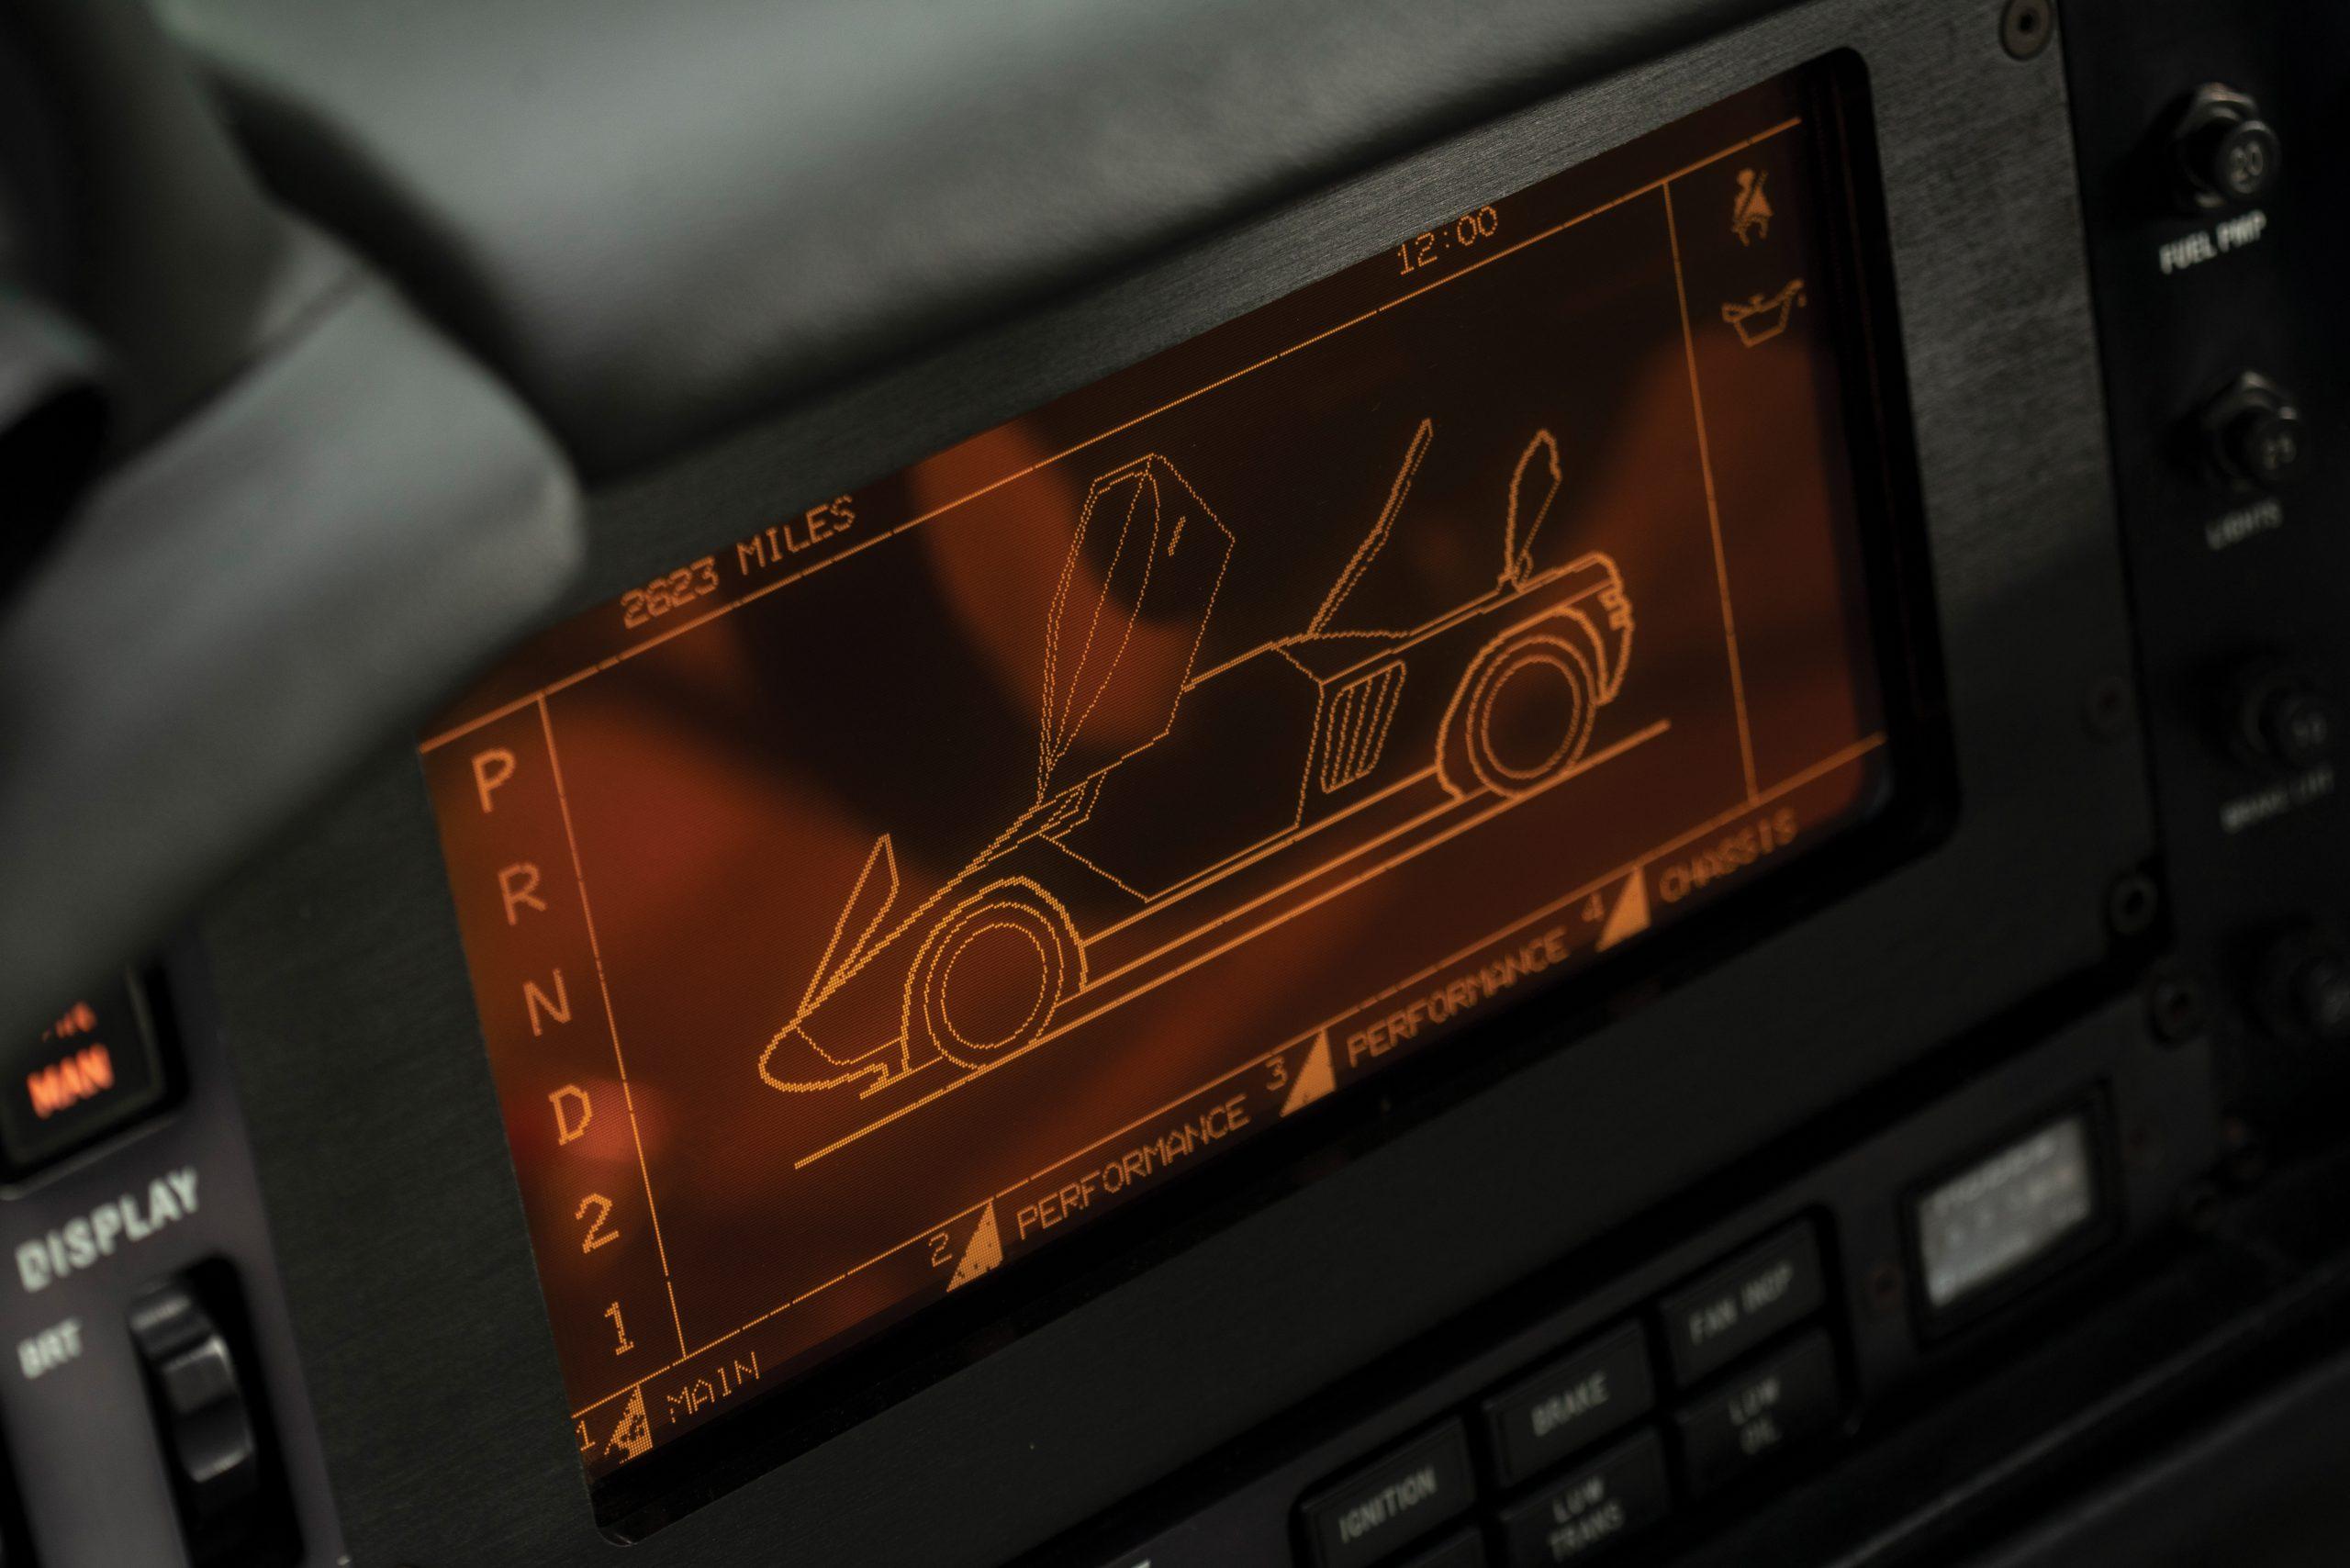 1993 Vector Avtech WX Prototype interior digital dash